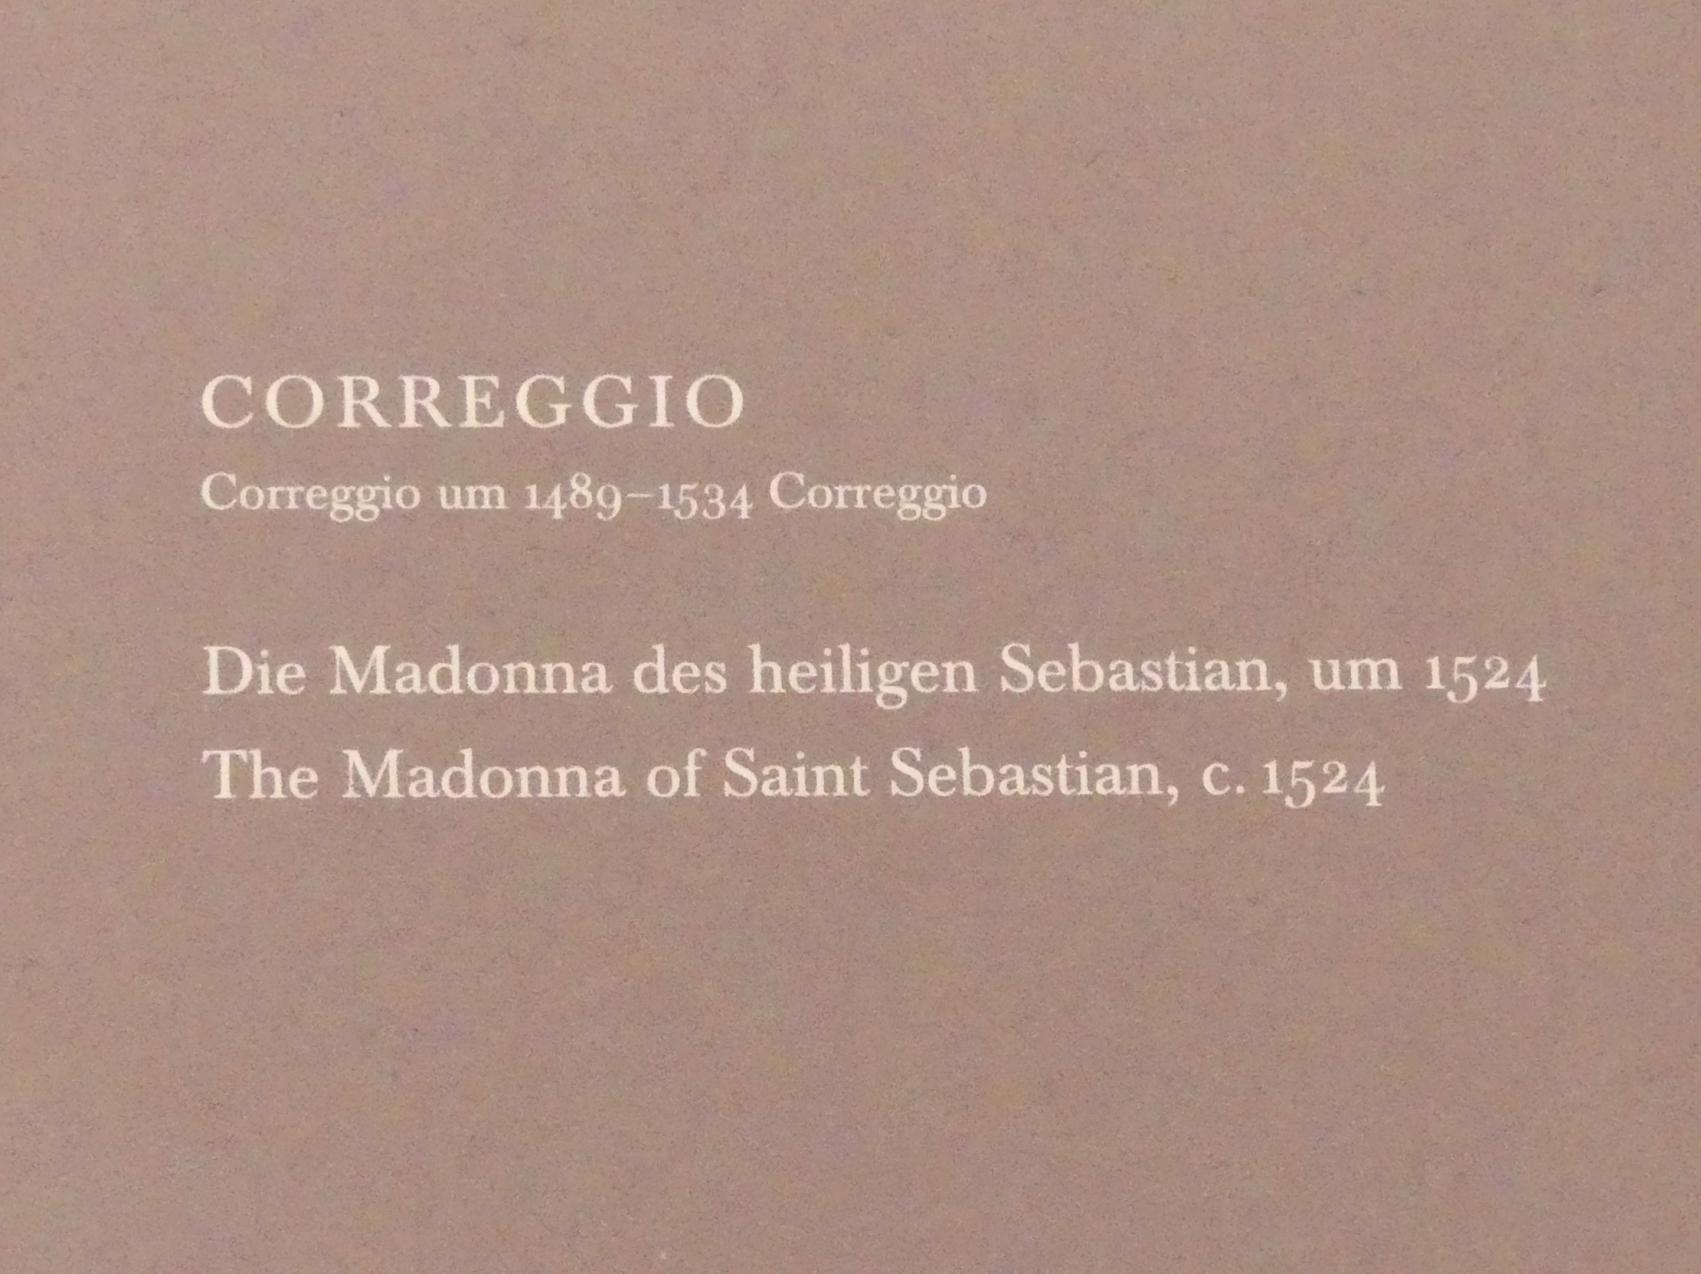 Antonio Allegri (Correggio): Die Madonna des heiligen Sebastian, Um 1524